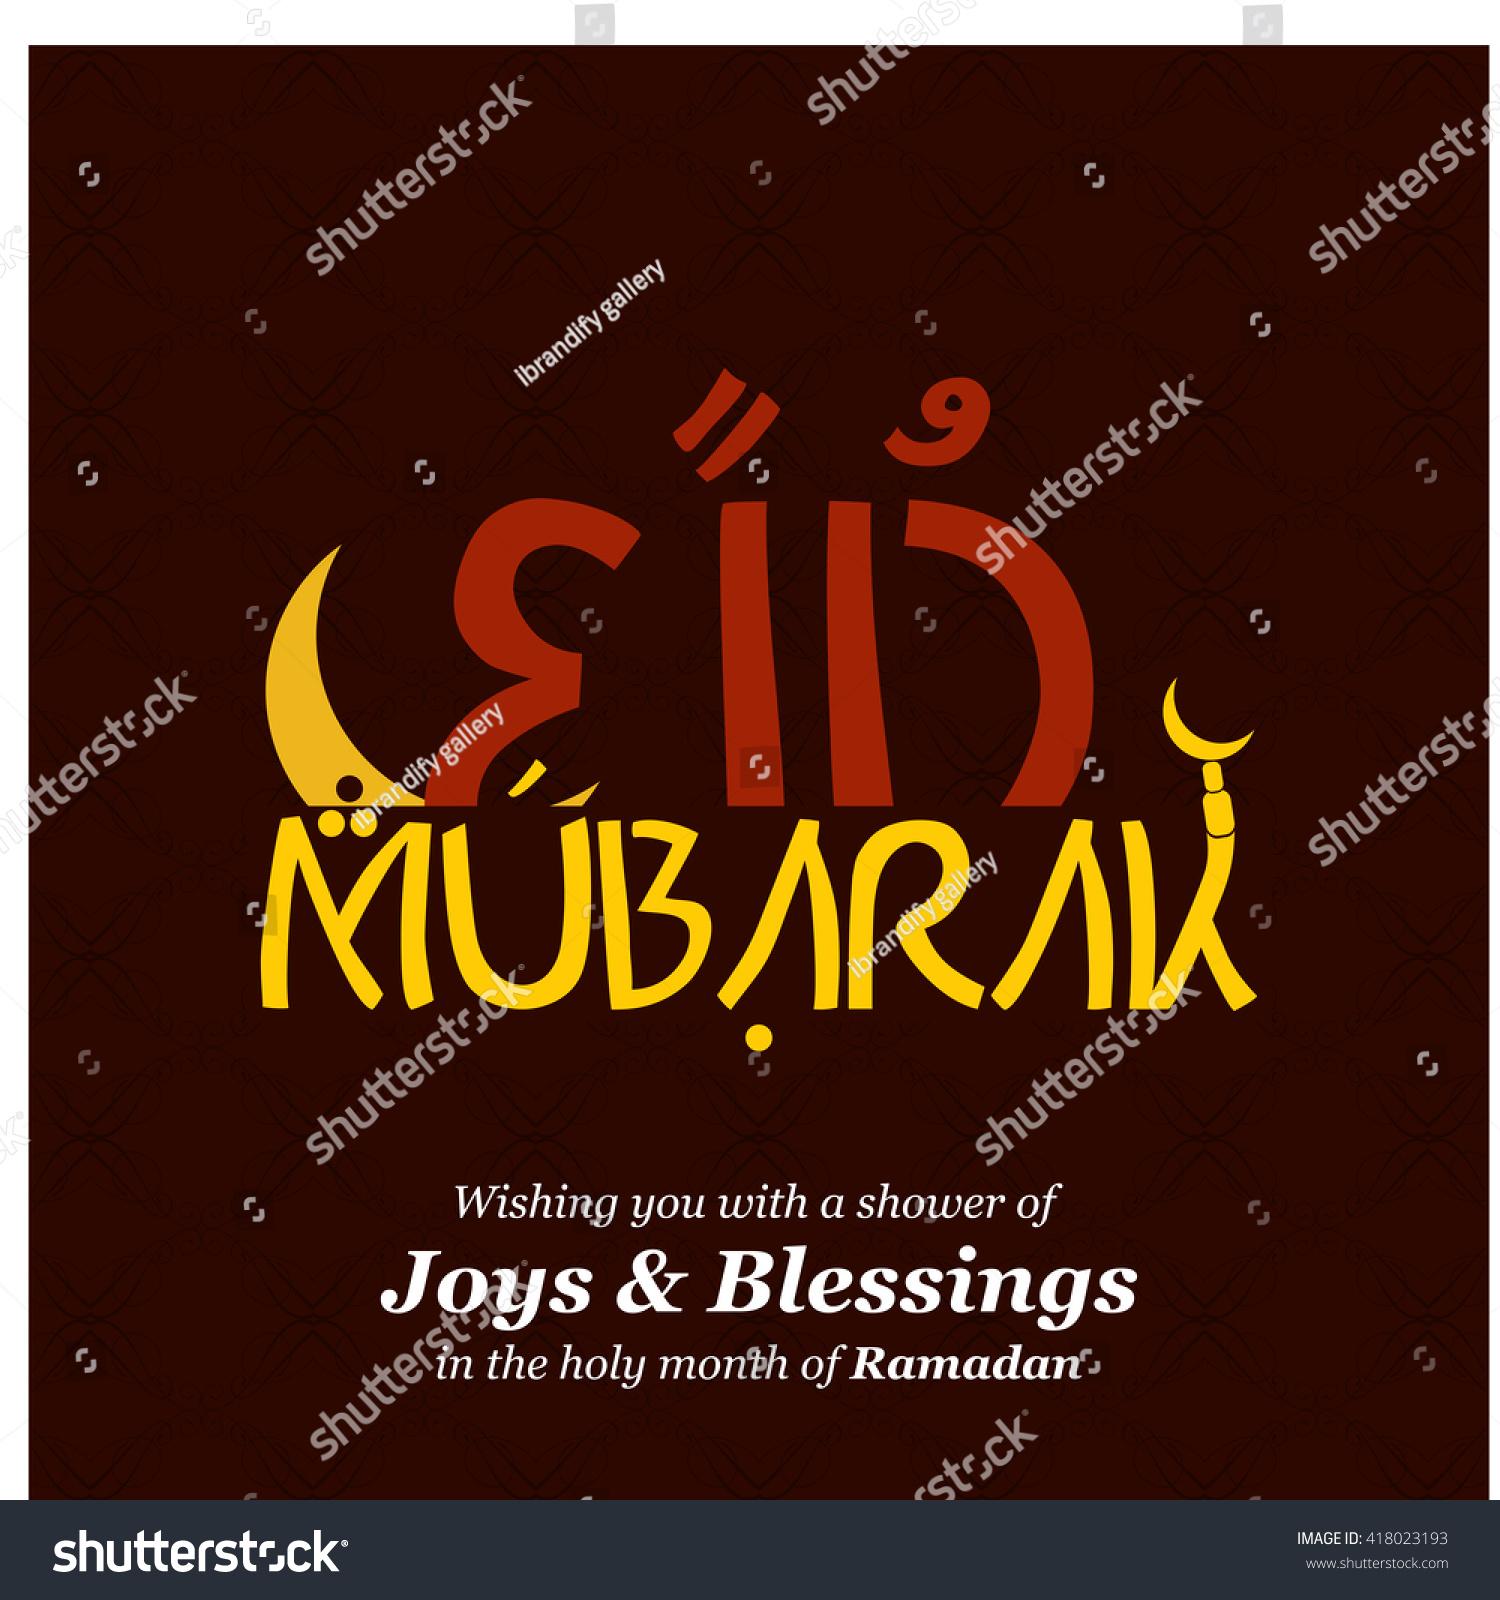 English Creative Vintage Background Eid Mubarak Stock Vector